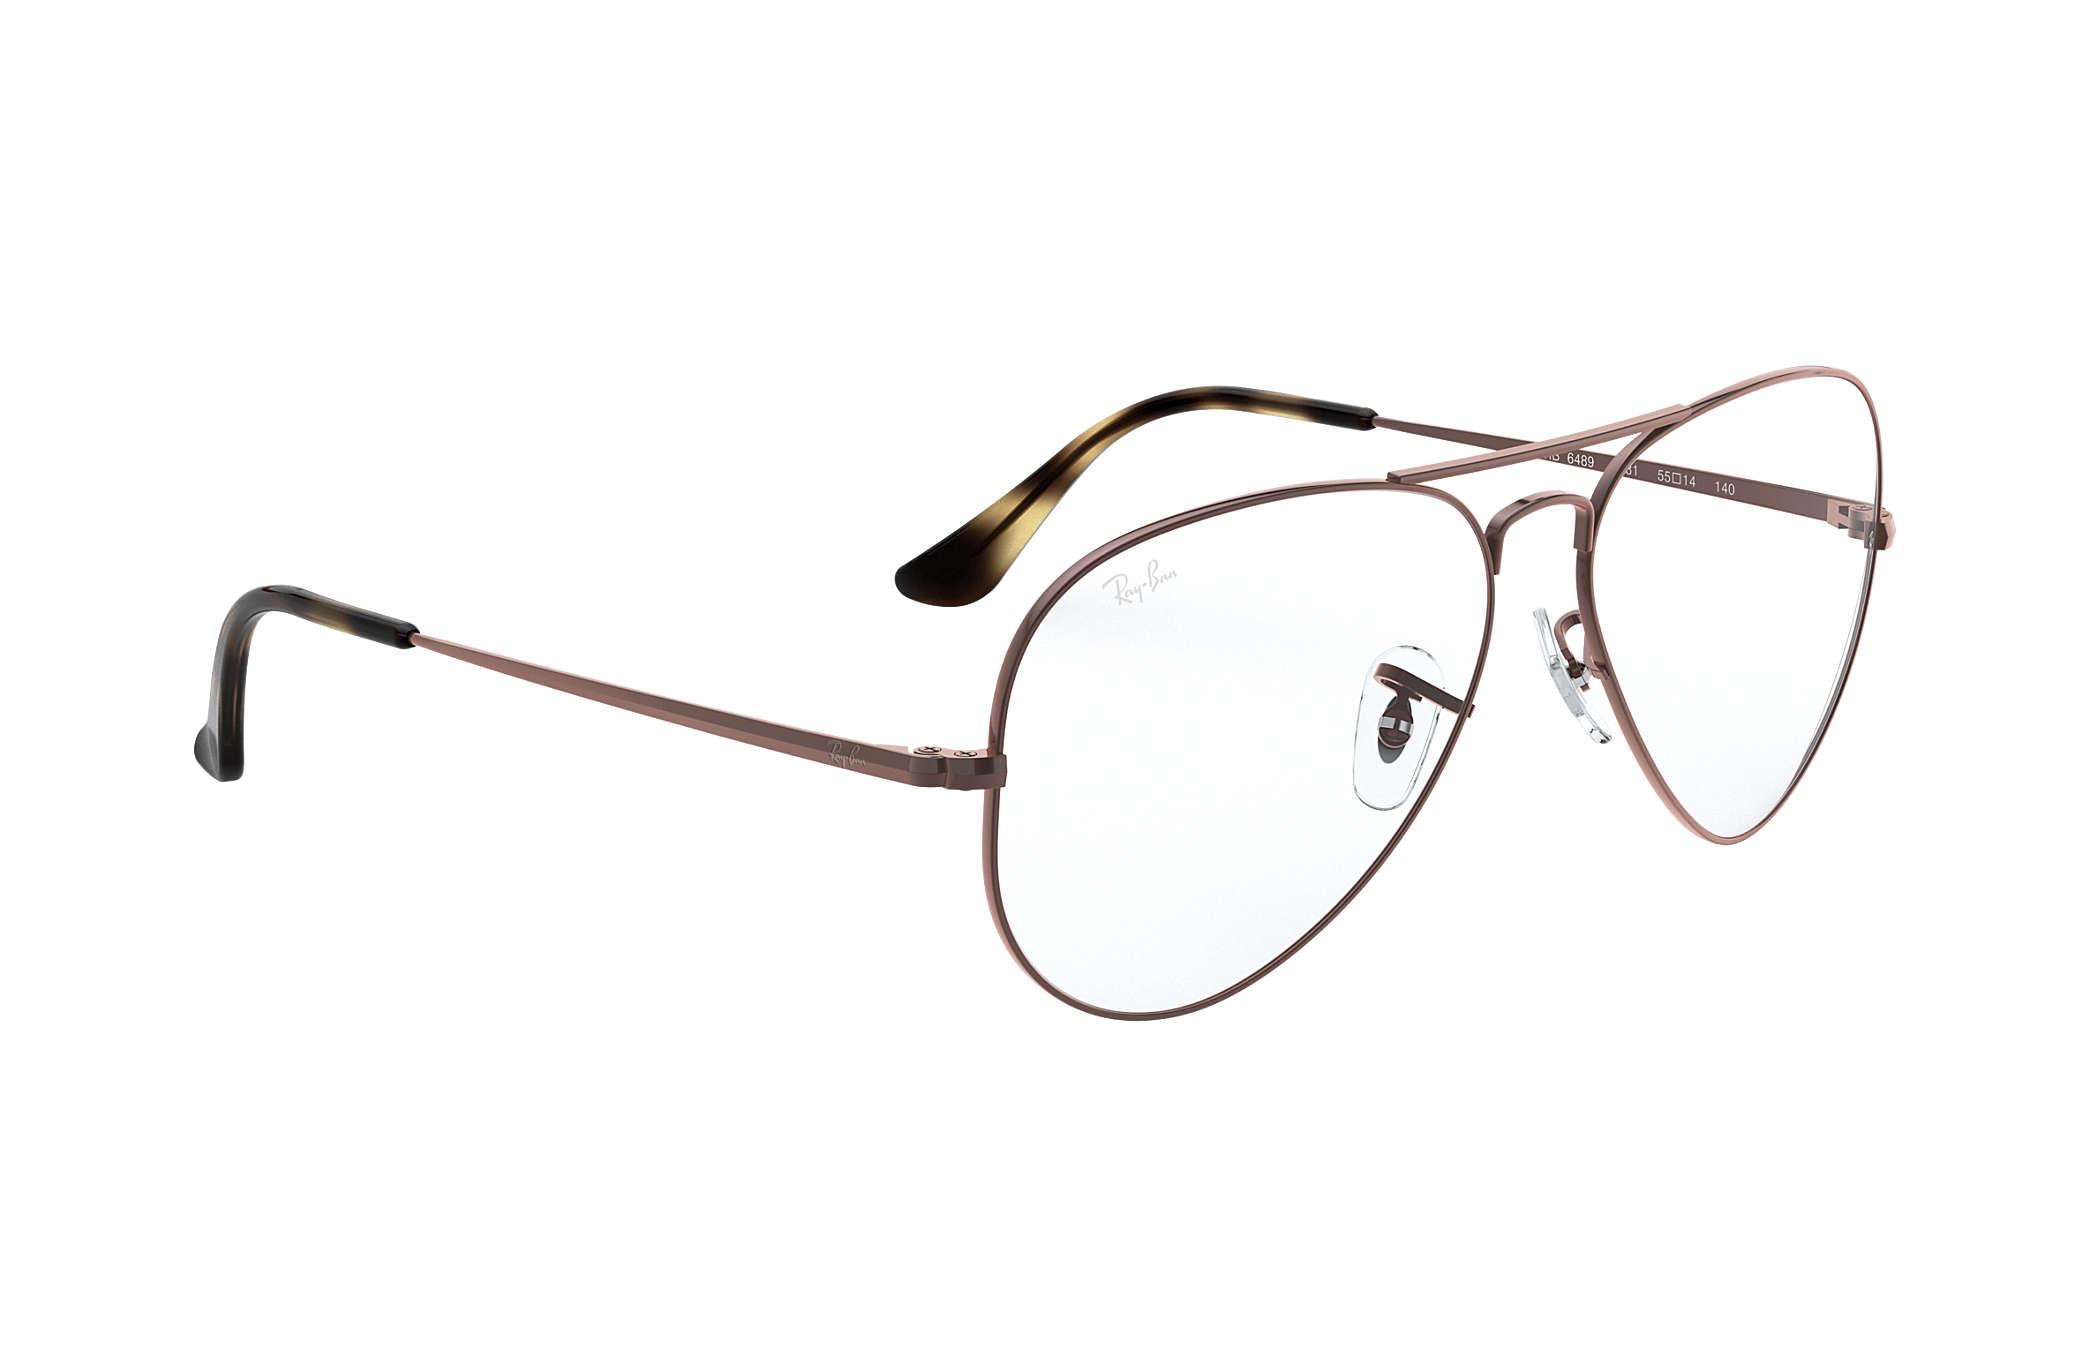 91e7110189 Ray-Ban prescription glasses Aviator Optics RB6489 Light Brown ...